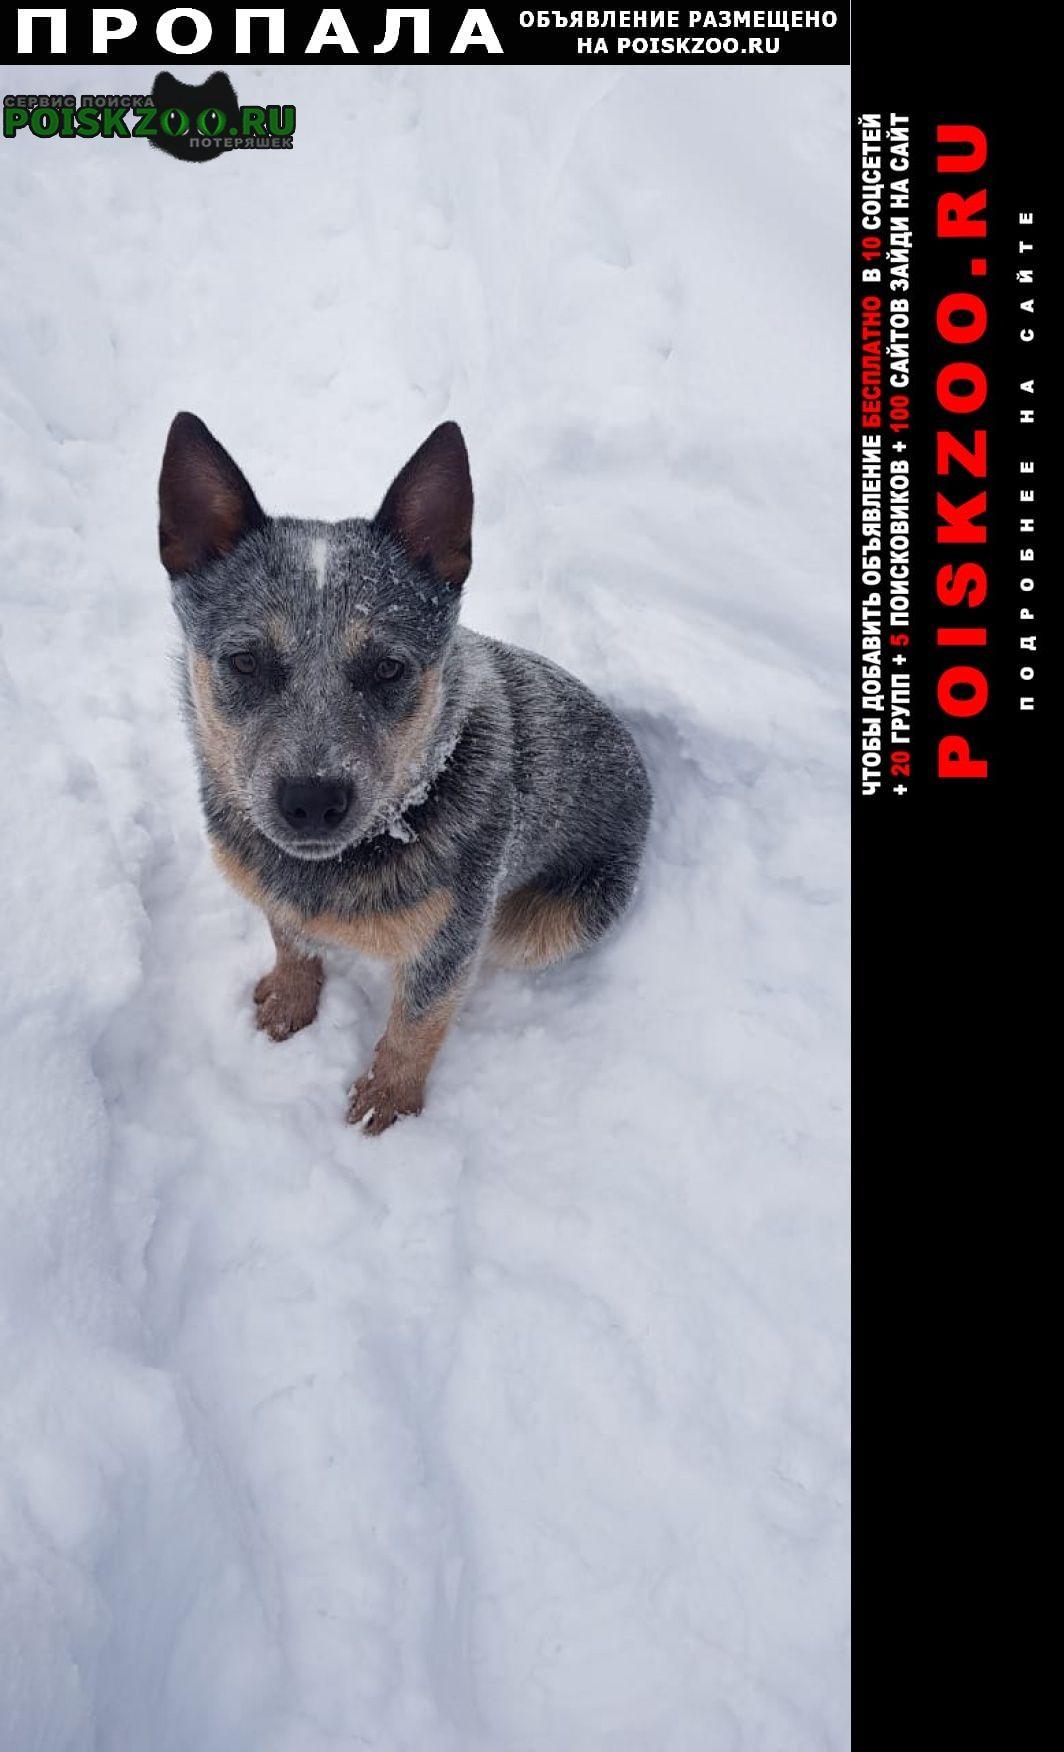 Санкт-Петербург Пропала собака